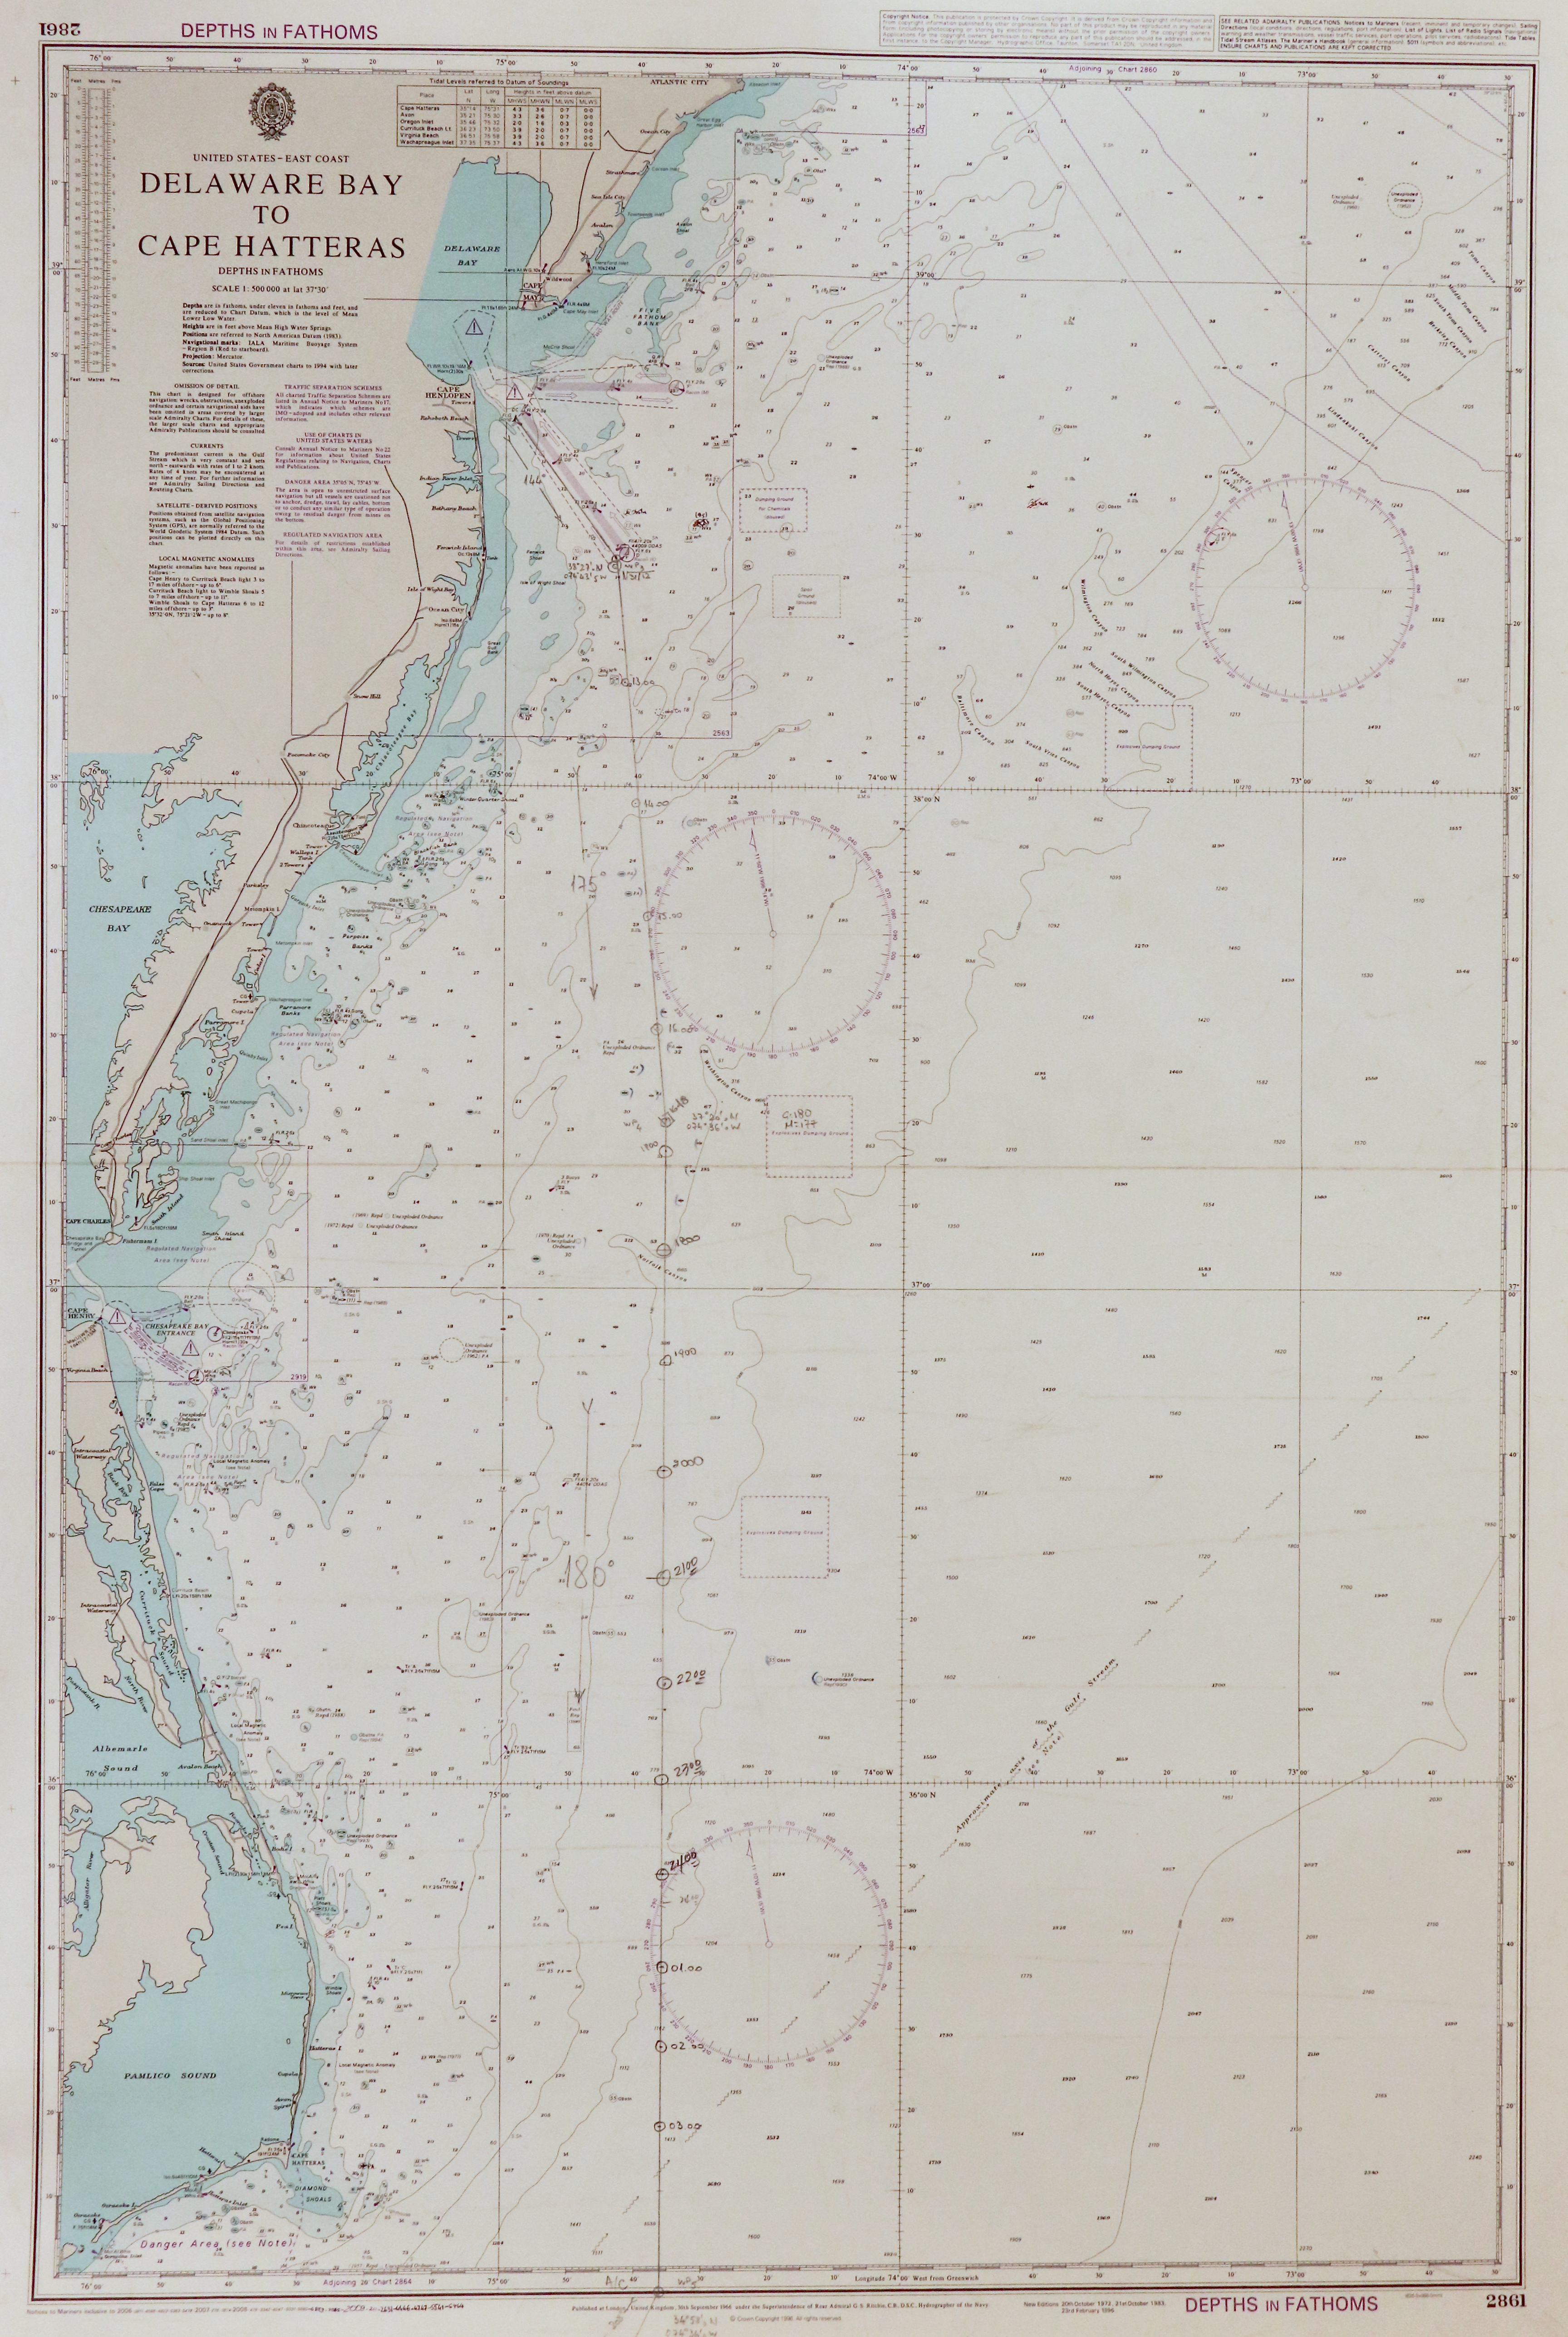 35 - Delaware Bay to Cape Hatteras